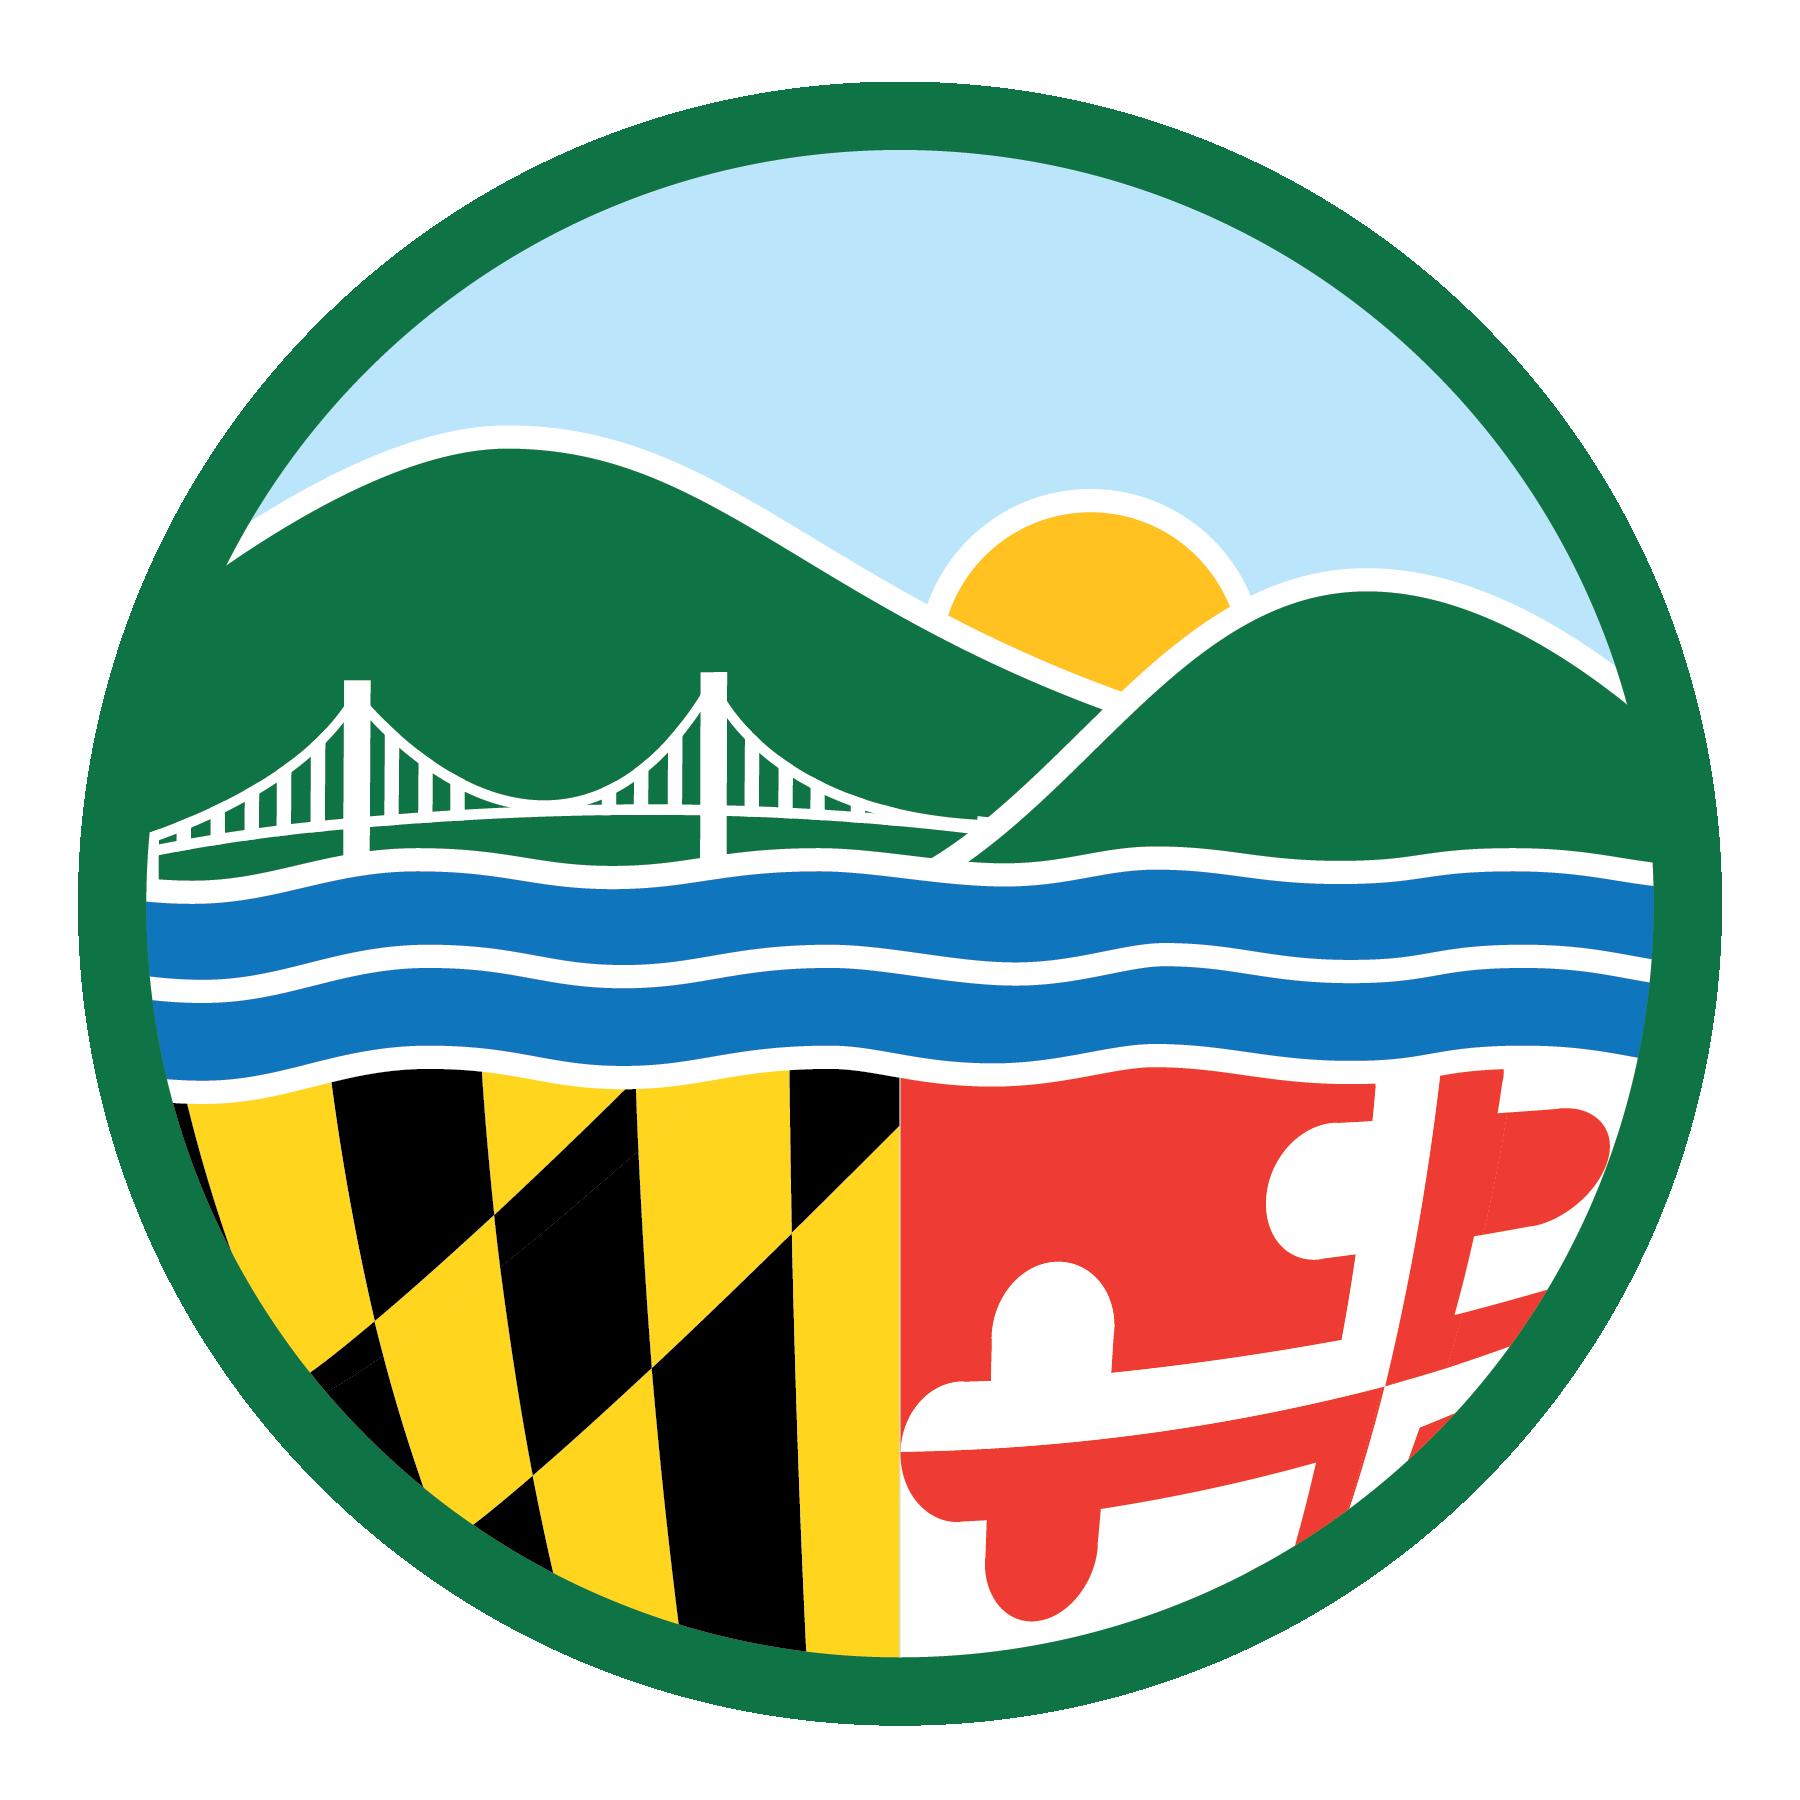 Mde downloads circular symbol. Environment clipart environment logo